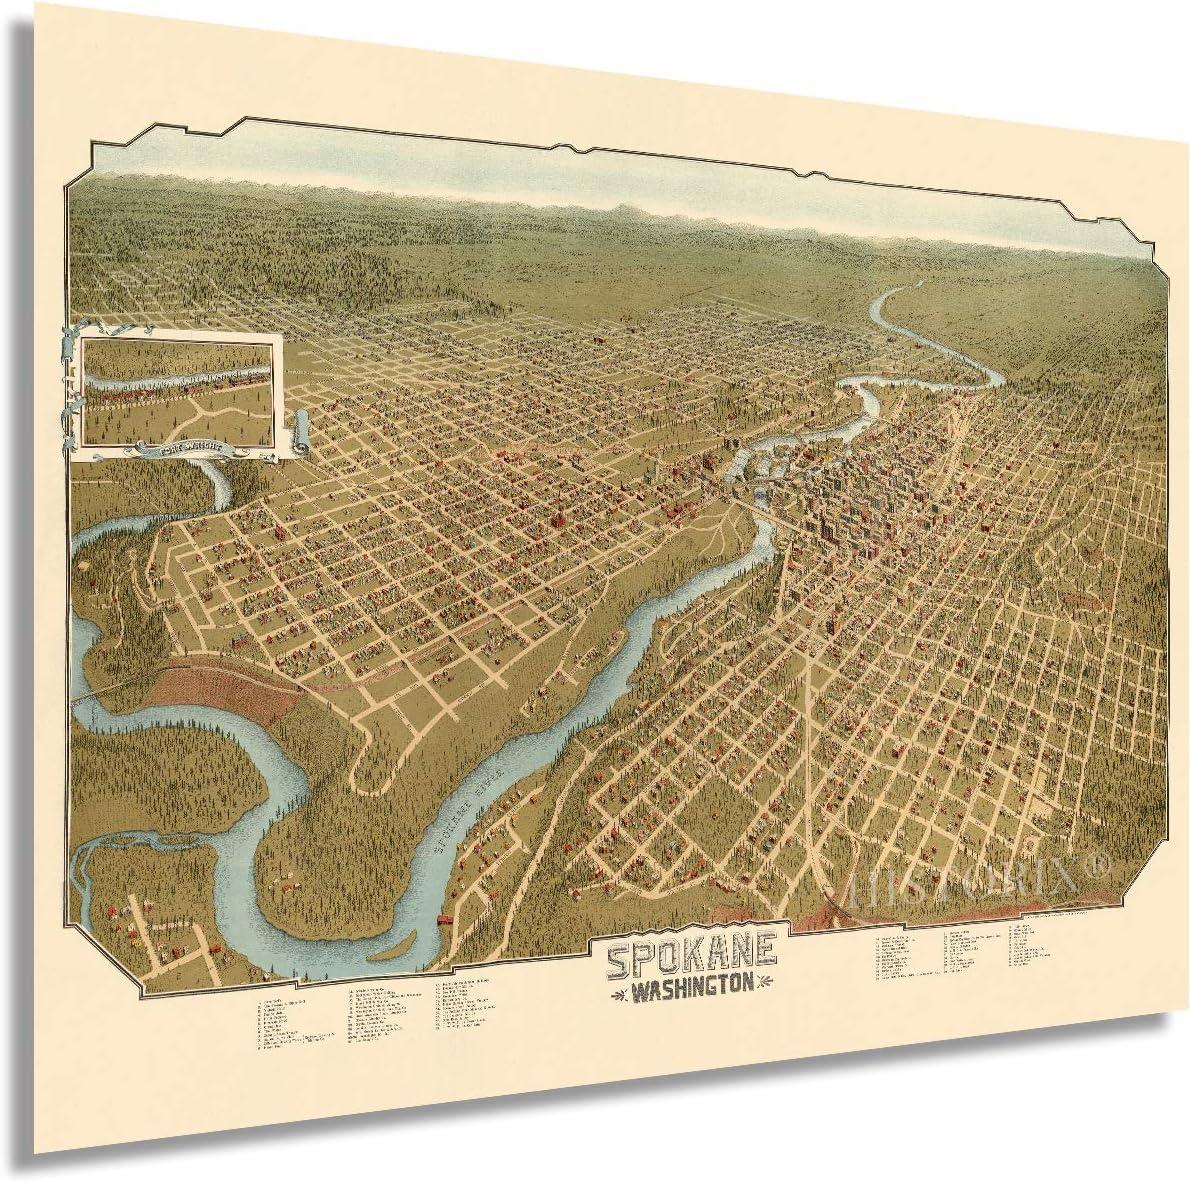 HISTORIX Vintage 1905 Spokane Complete Free Shipping Washington Max 54% OFF - 18x24 Vintag Map Inch